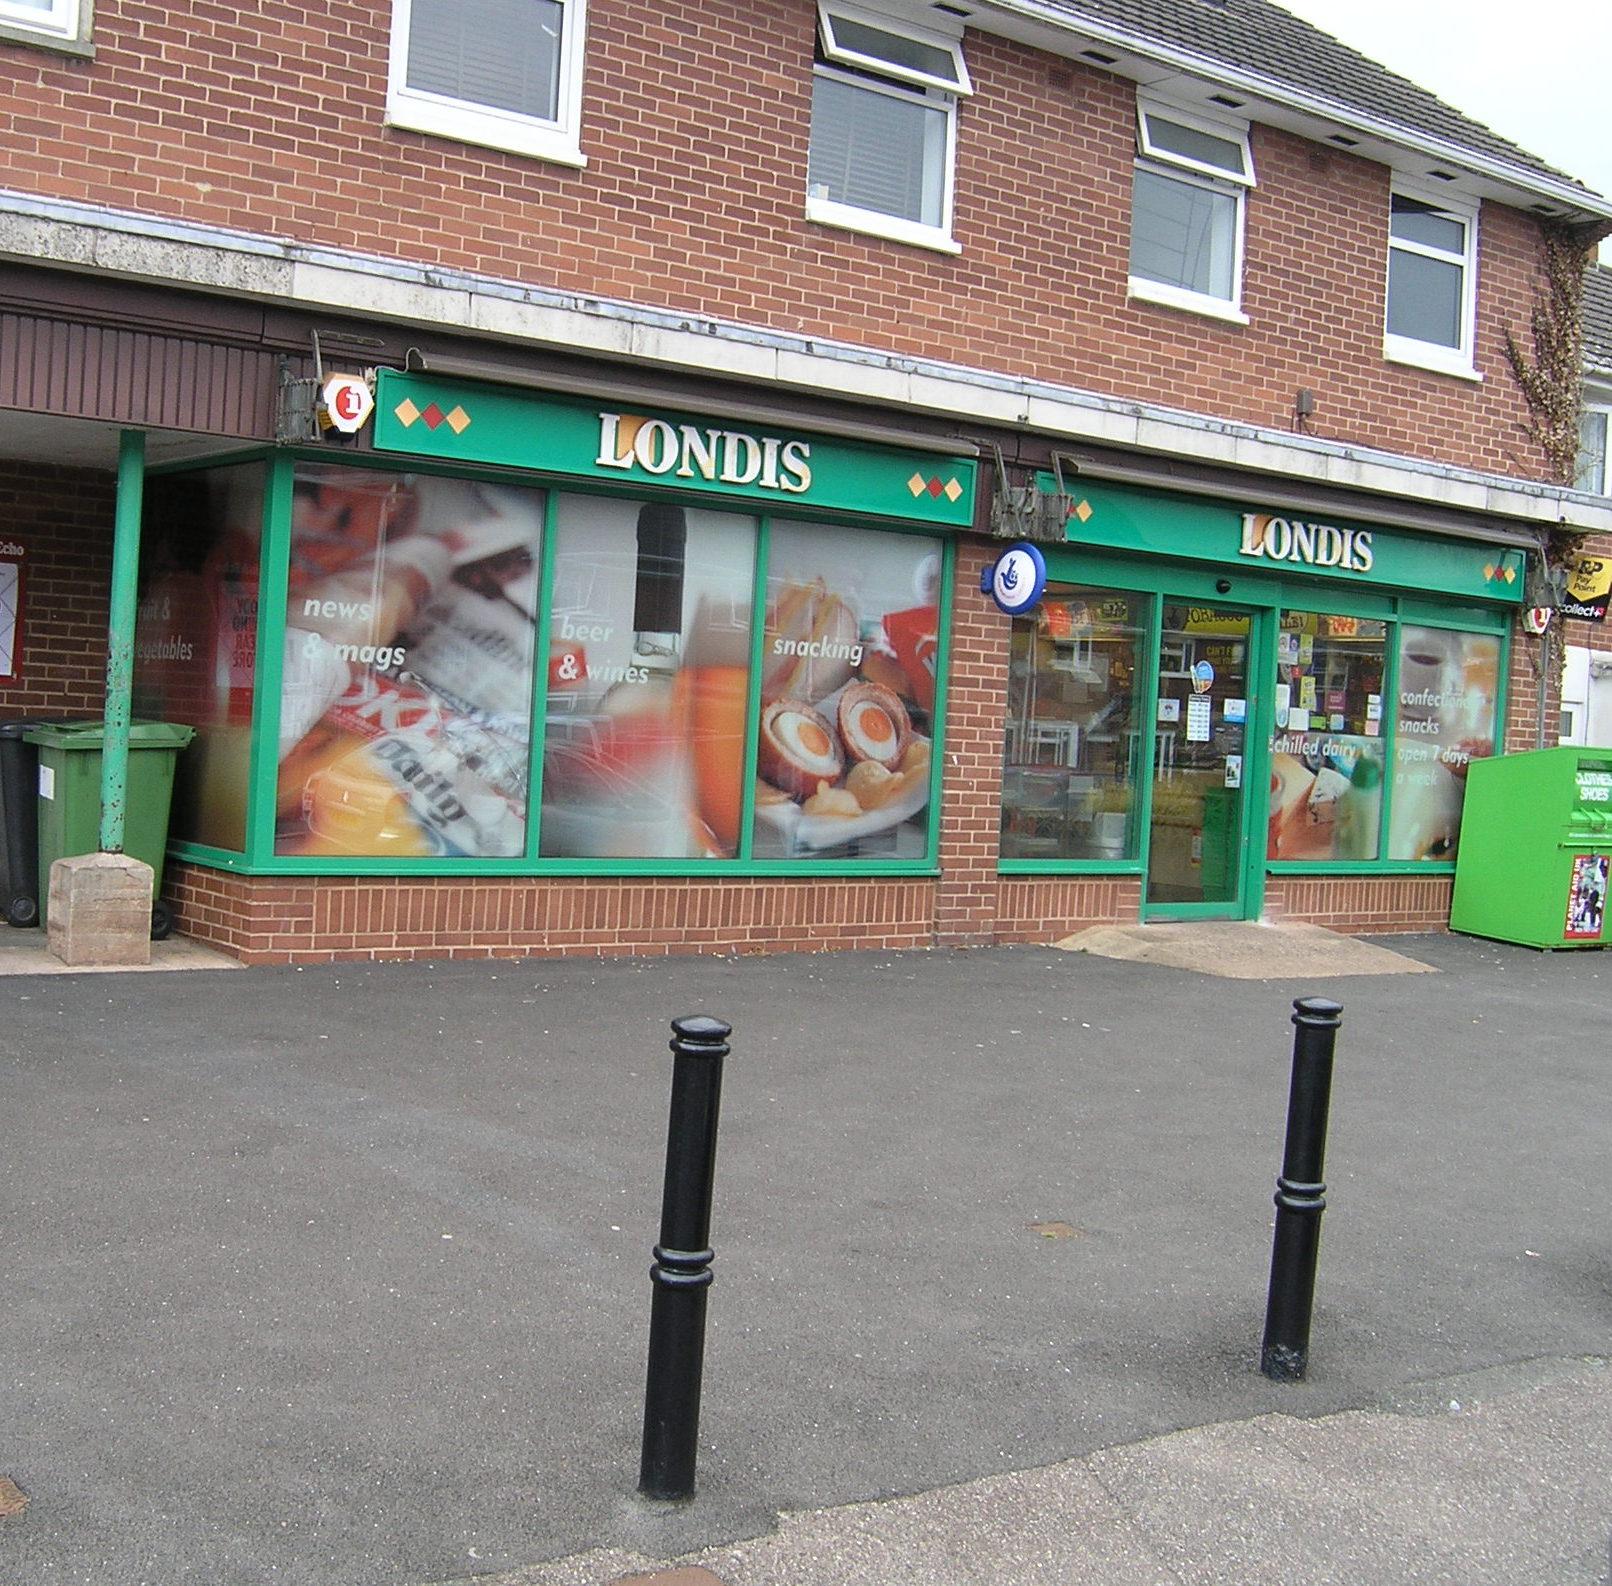 Londis Convenience Store, Exeter, Devon